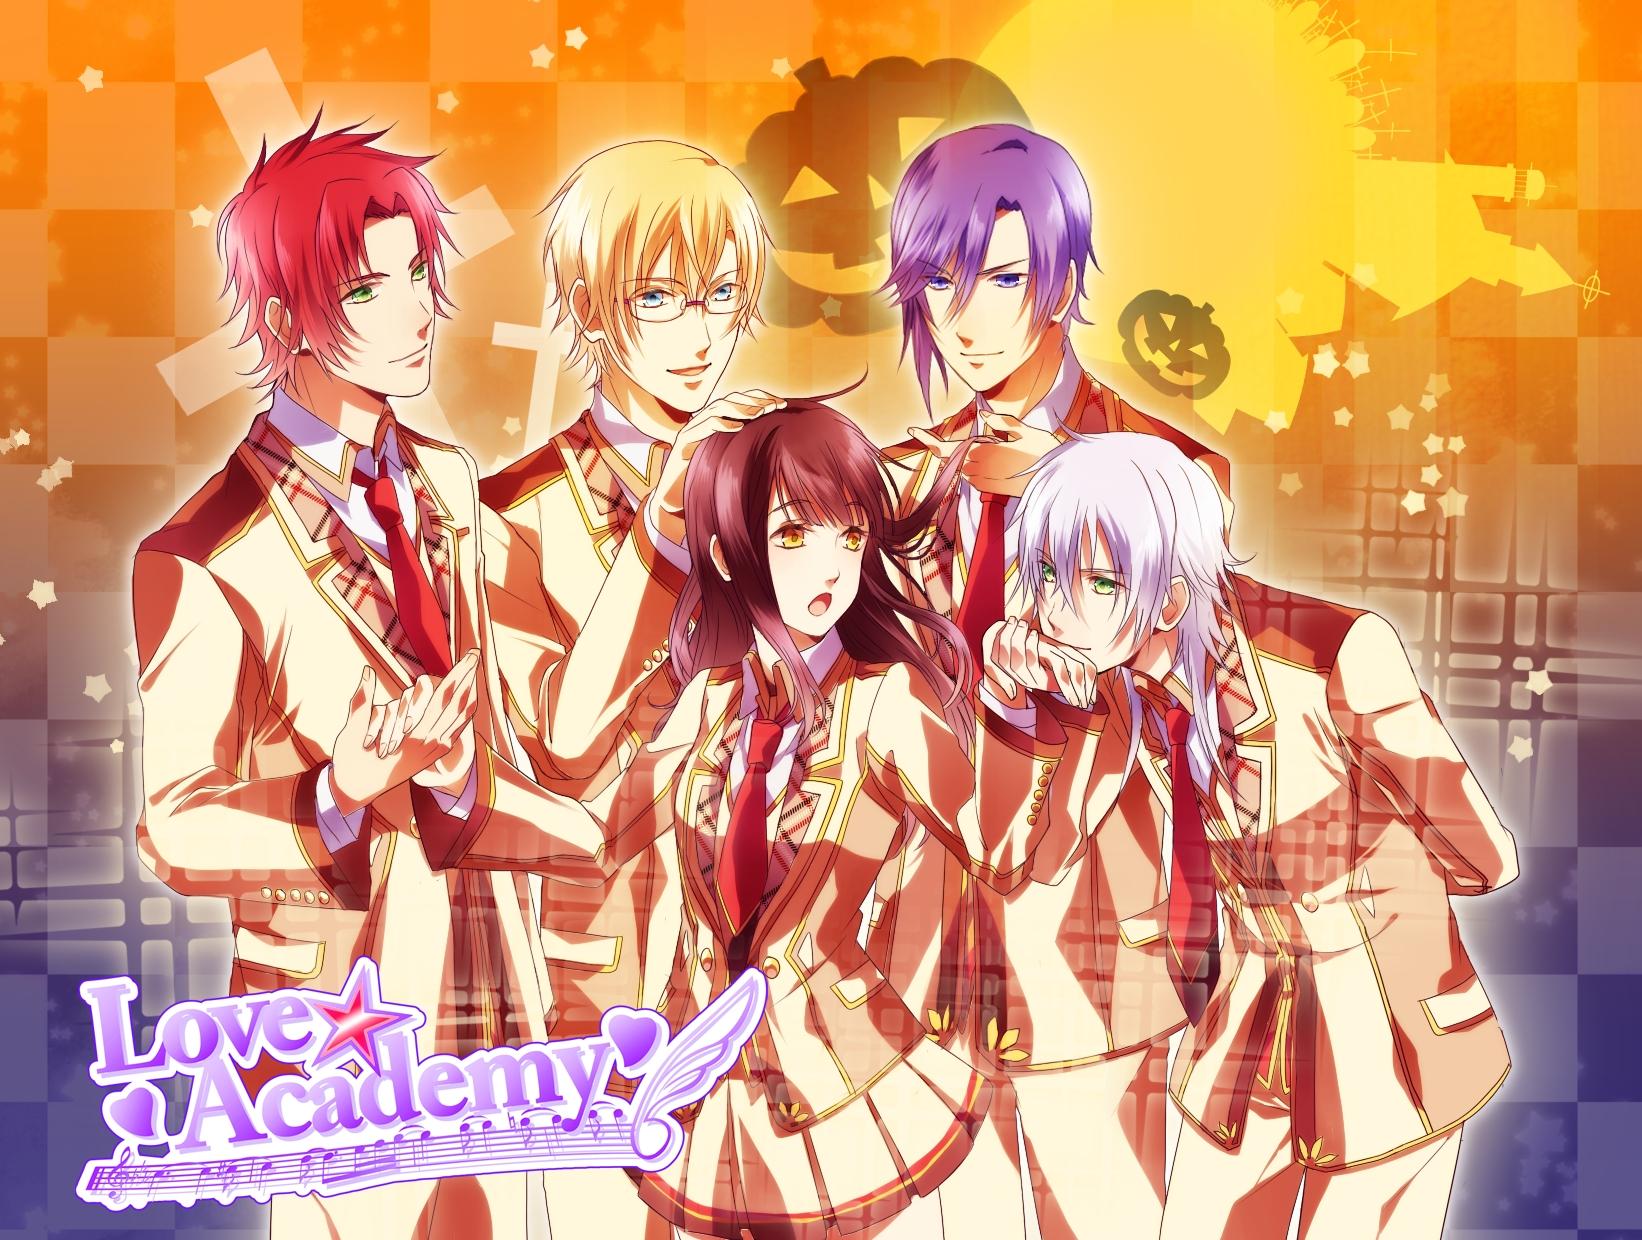 Top 10 Best Reverse Harem Anime | ReelRundown